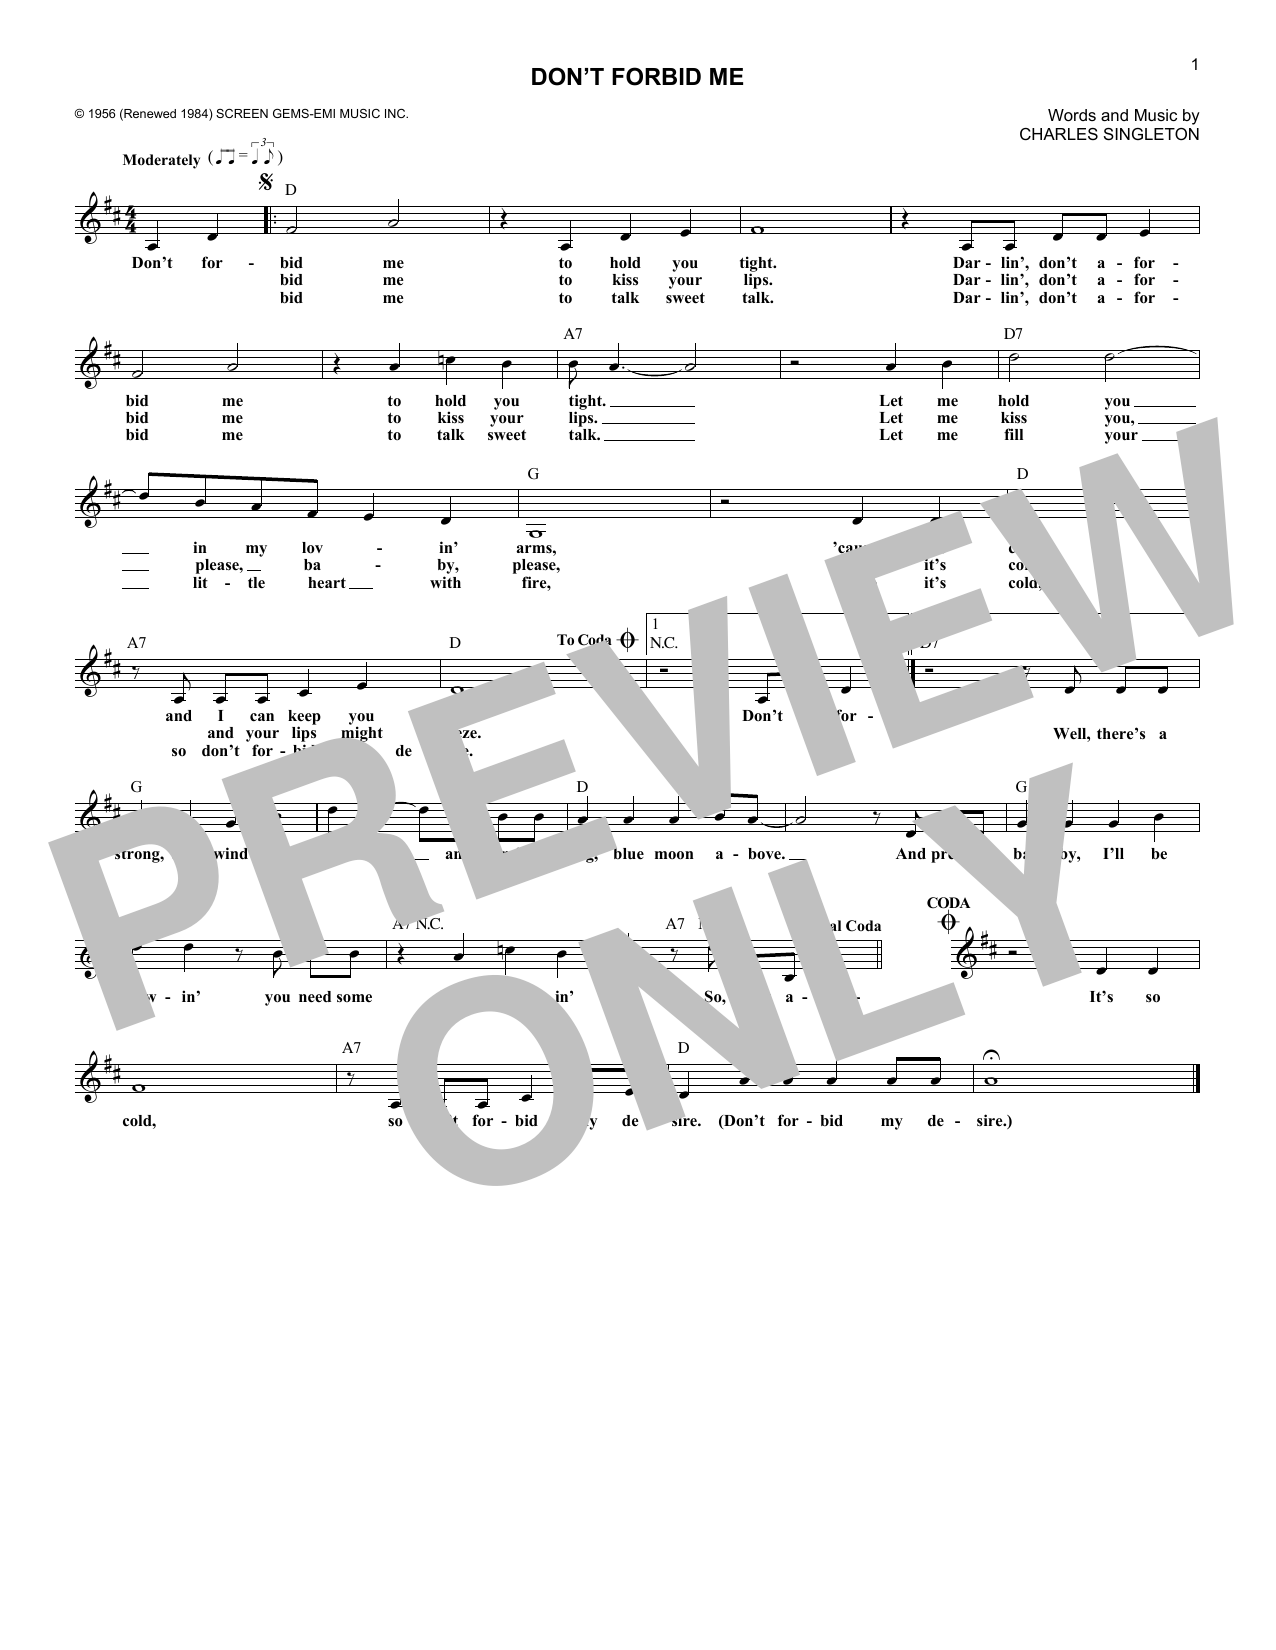 Pat Boone - Don't Forbid Me